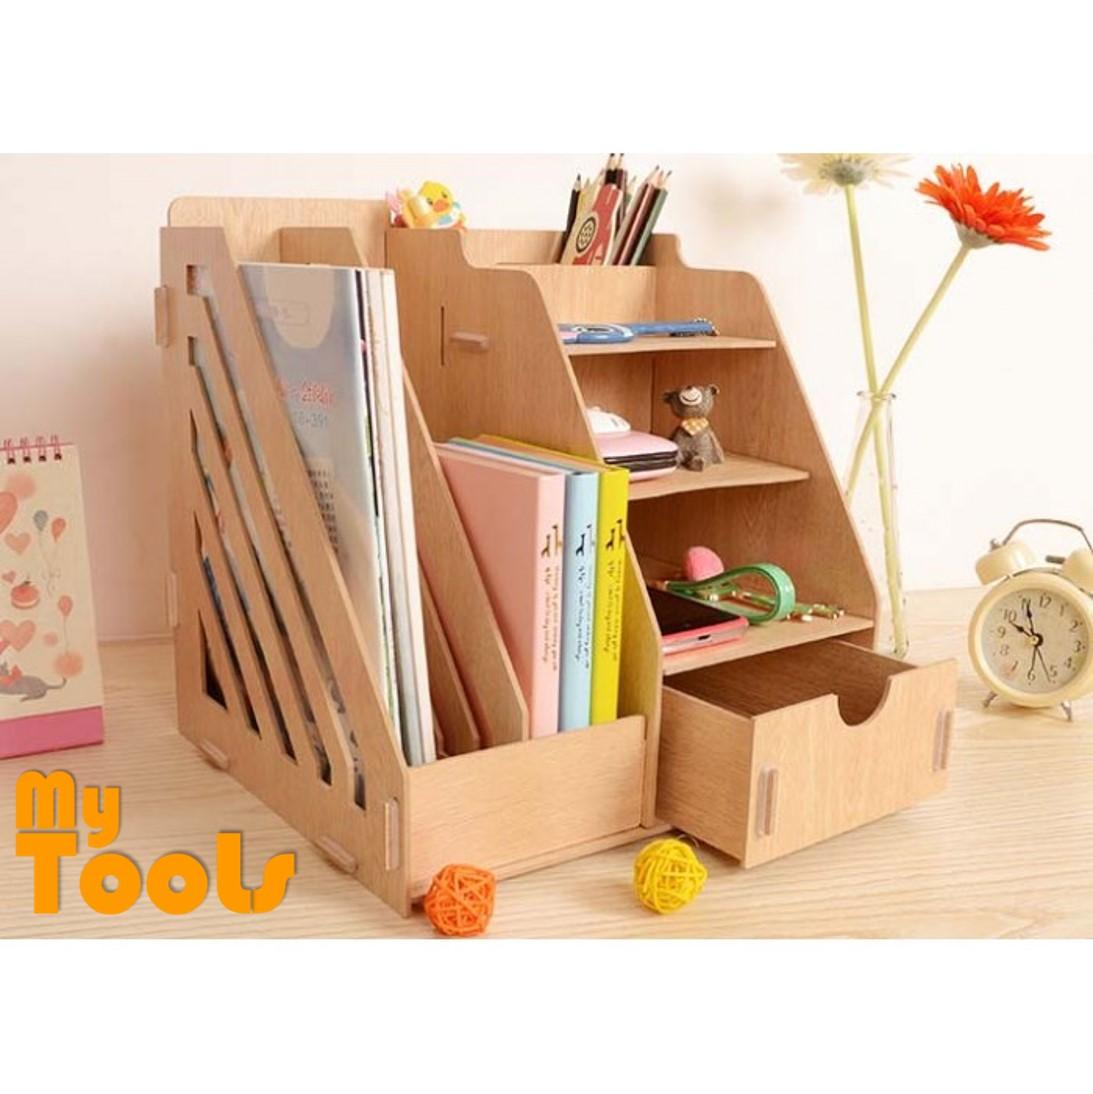 Mytools DIY Wooden Storage Organizer Book Shelf Rack